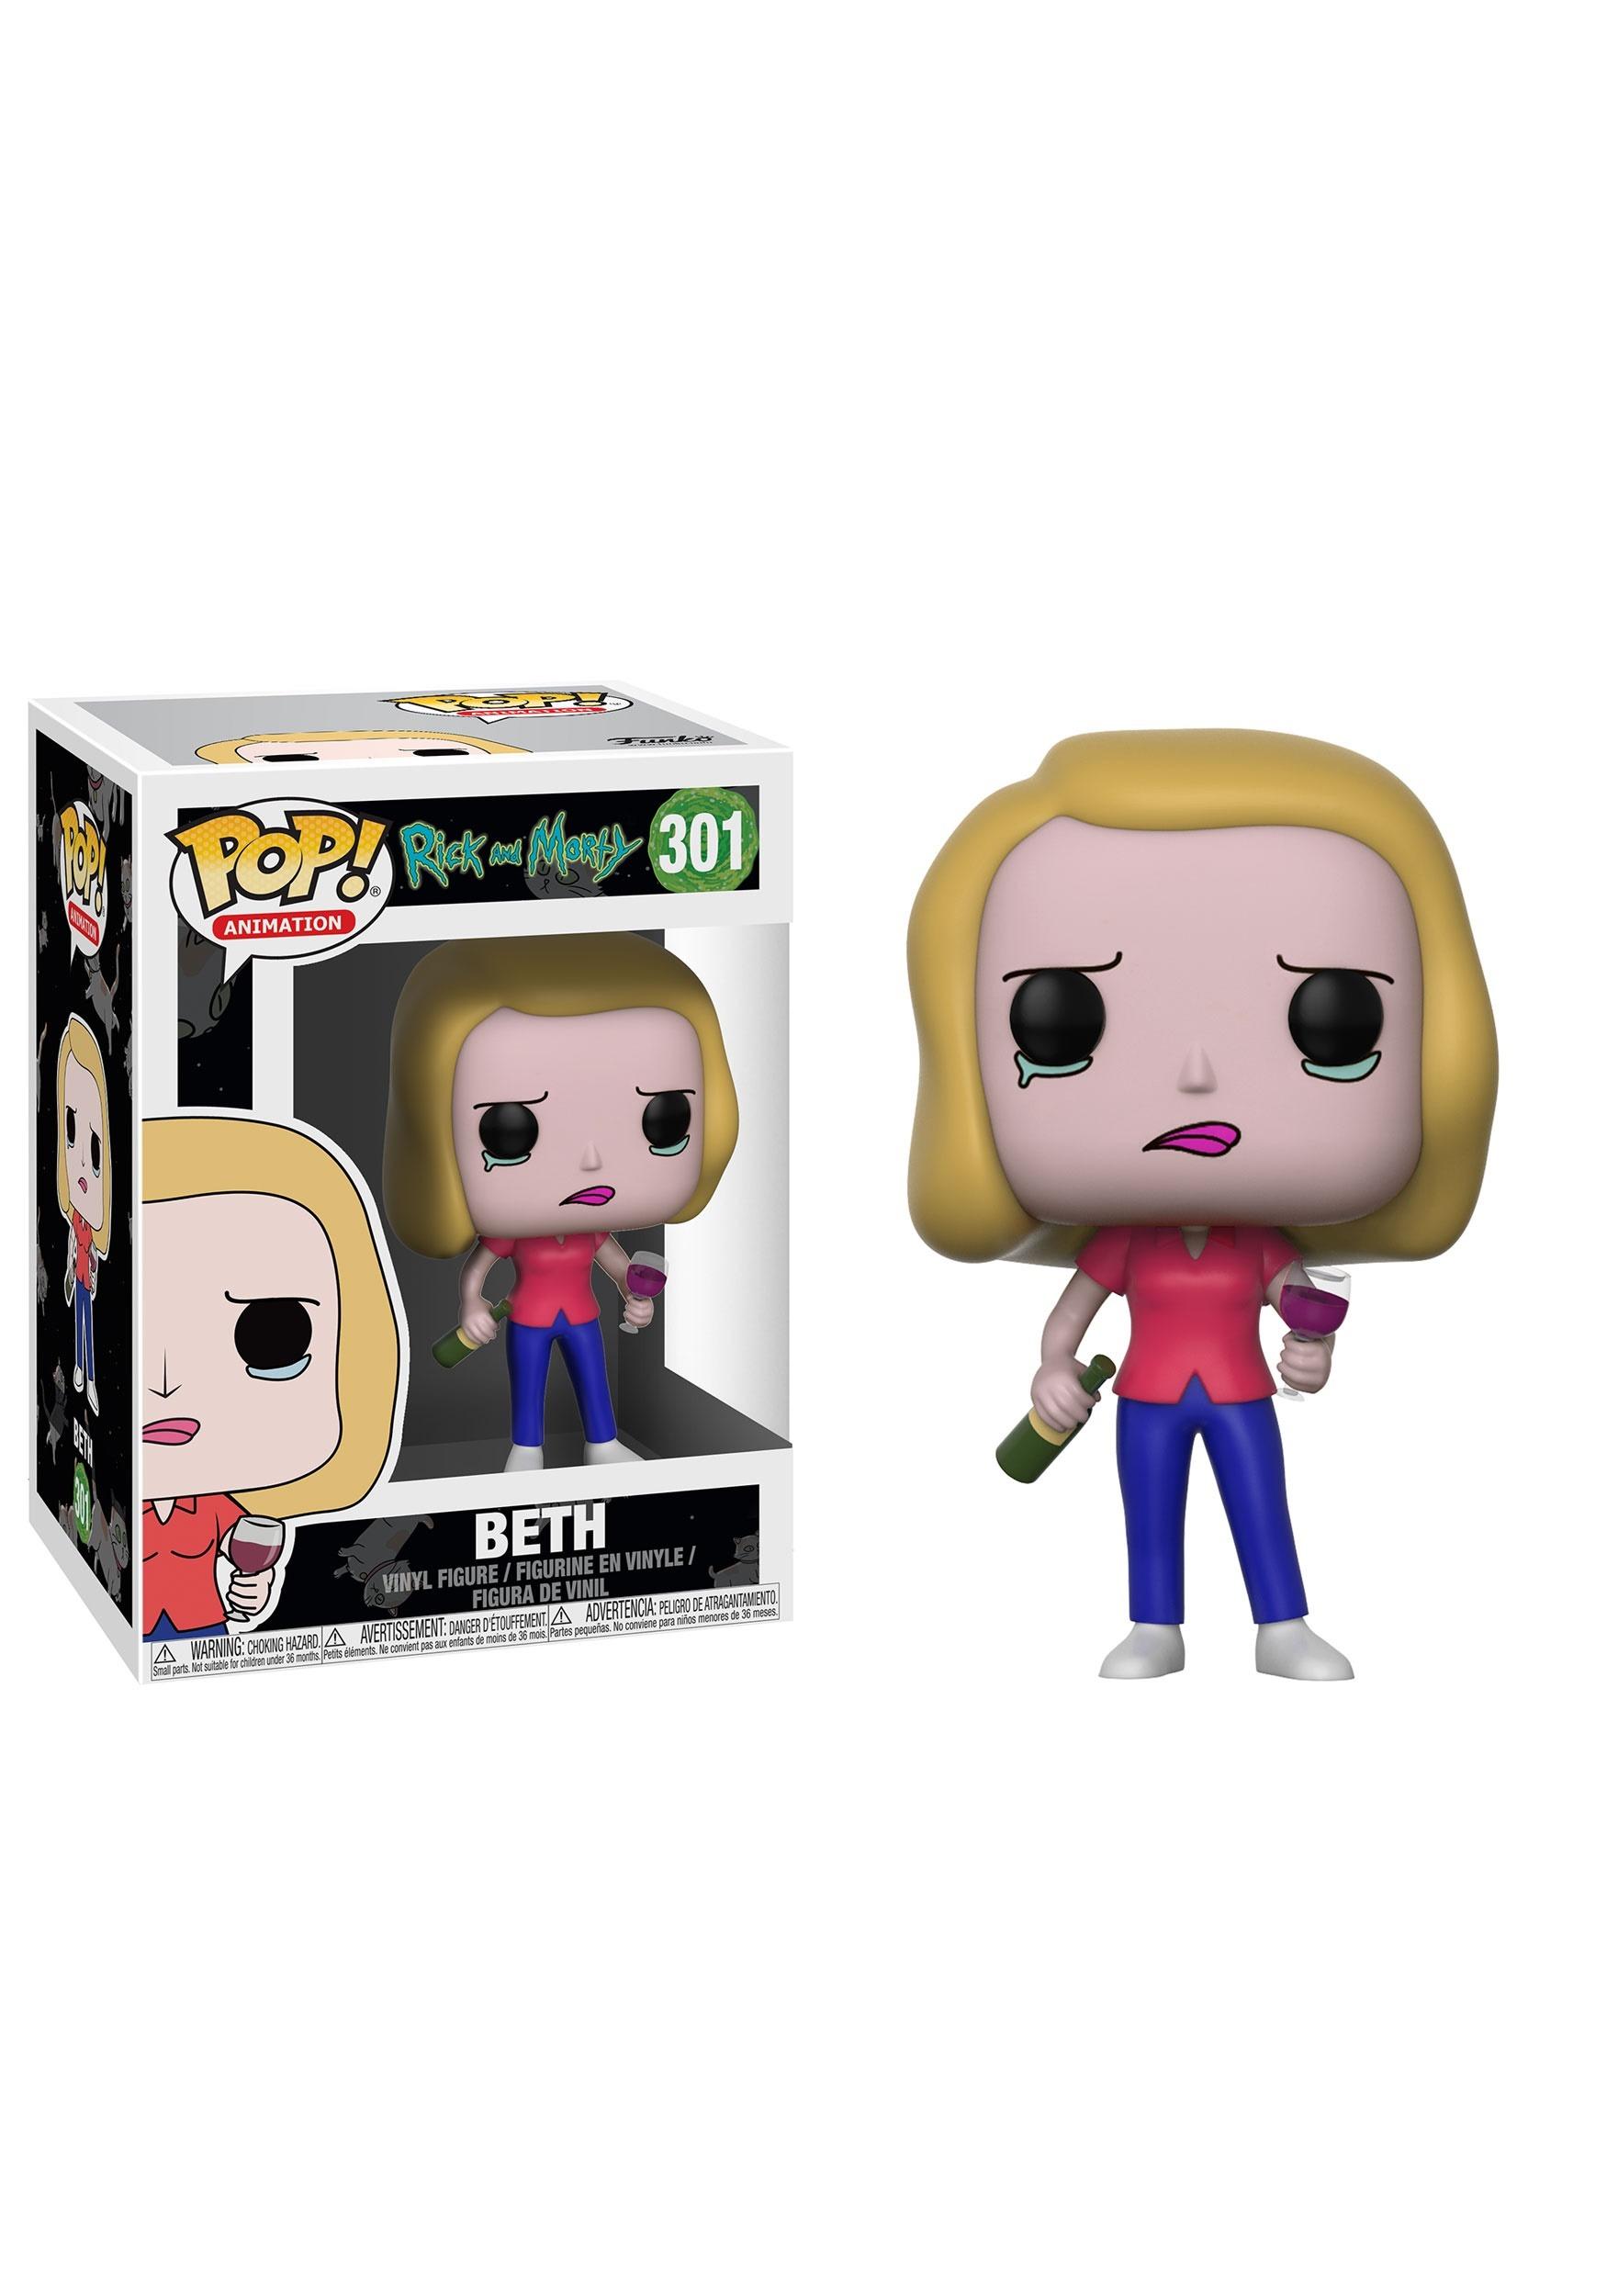 Rick and Morty Beth Figure - Pop! Vinyl Figures